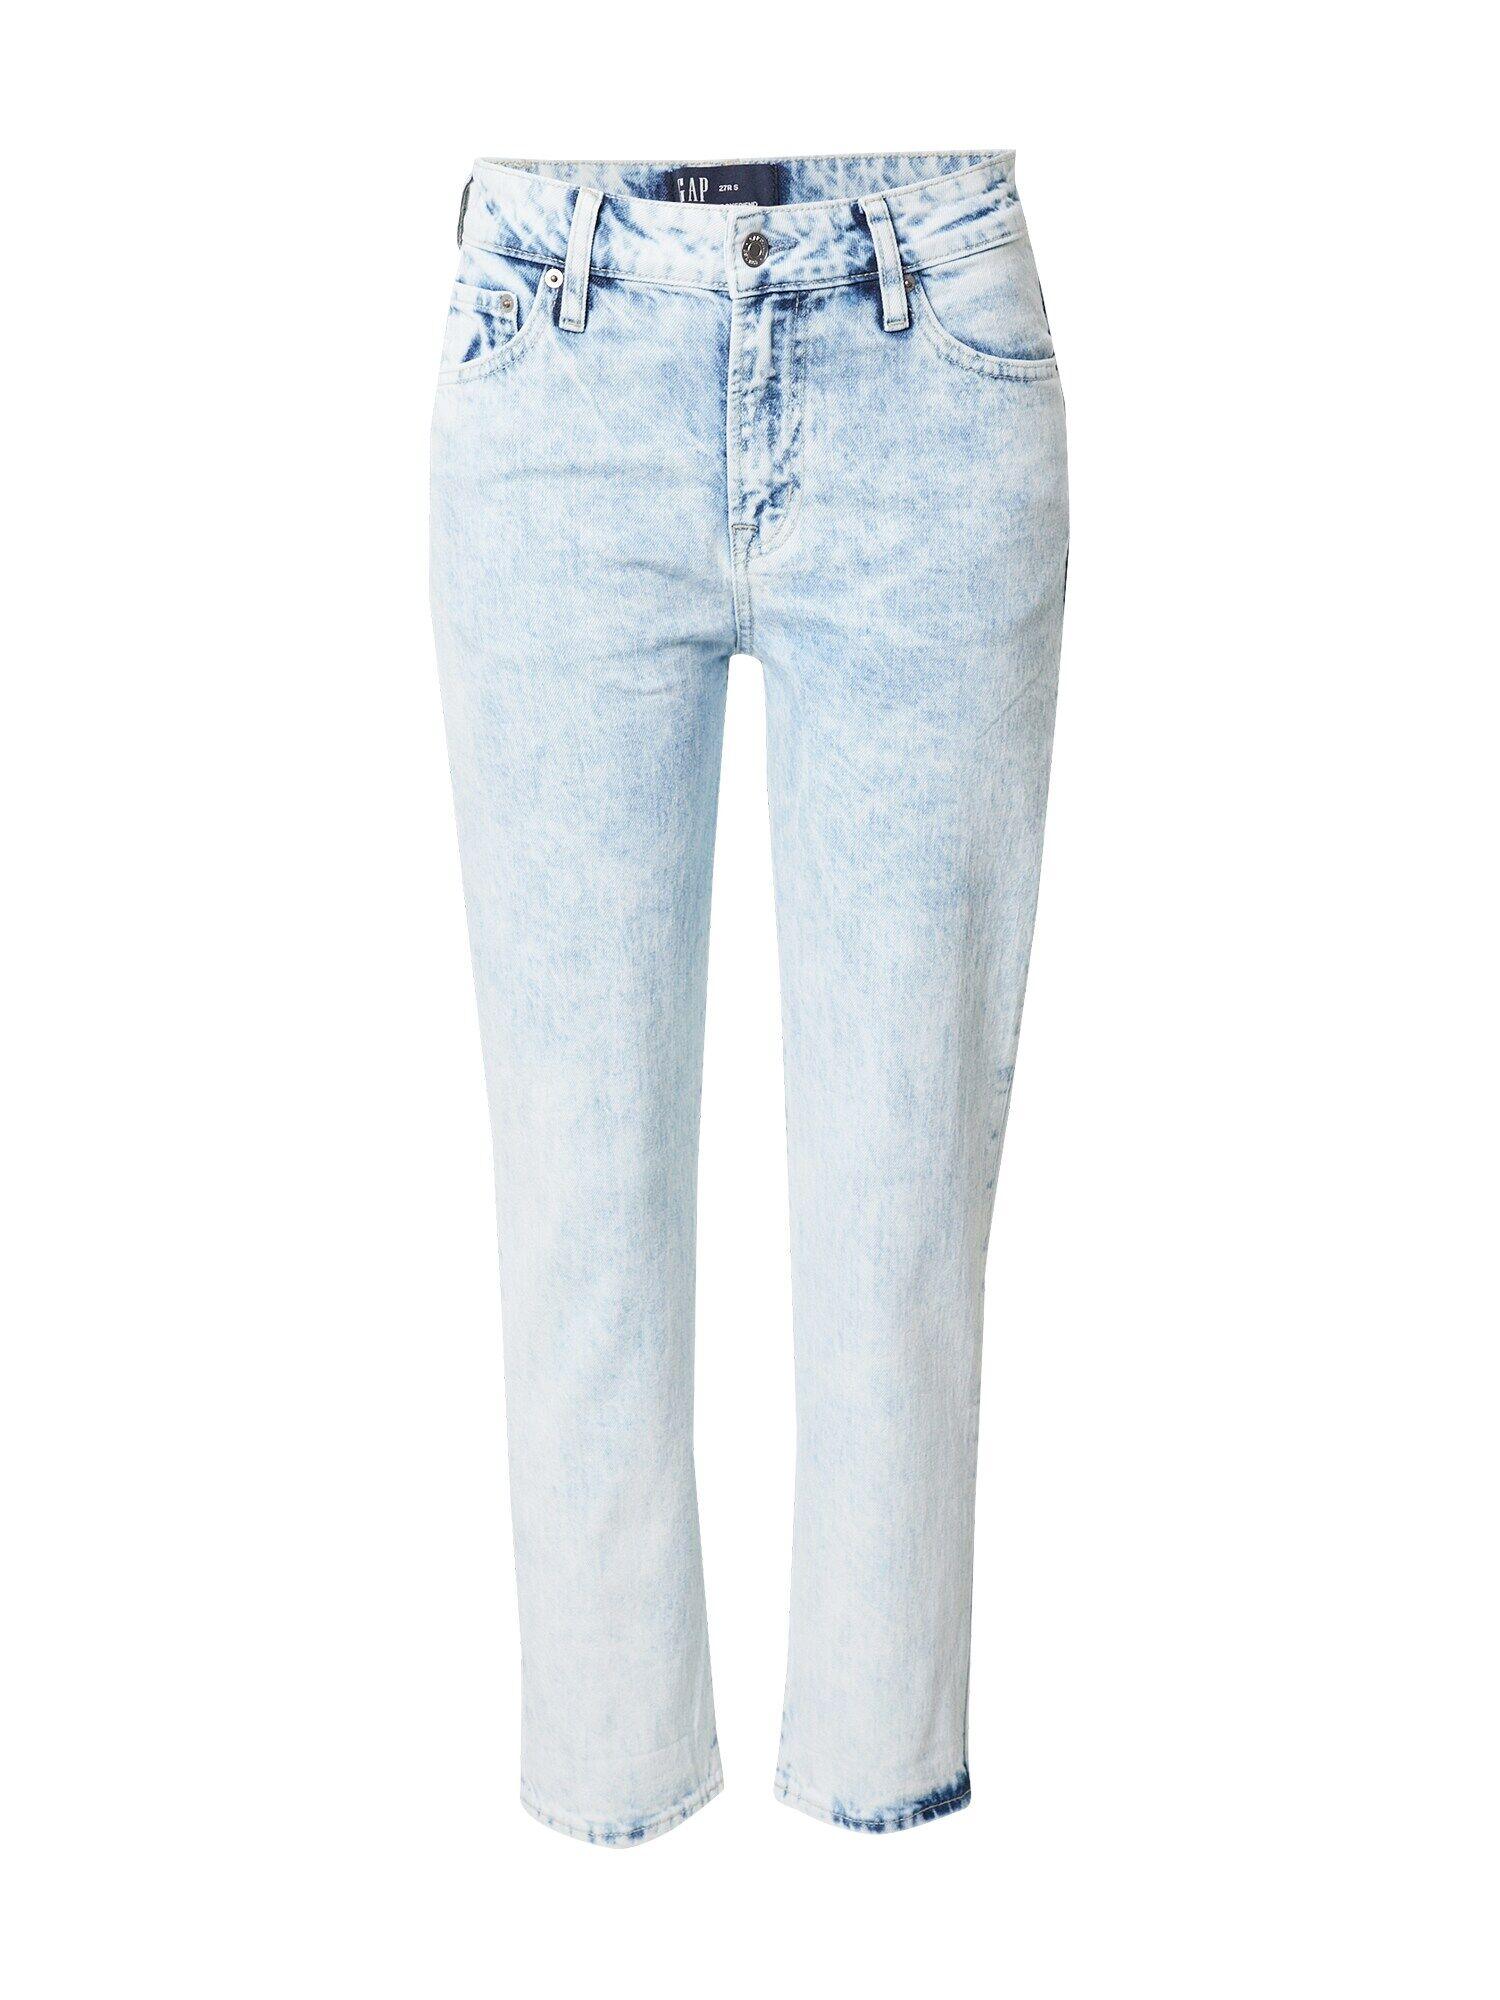 GAP Jean  - Bleu - Taille: 28 - female